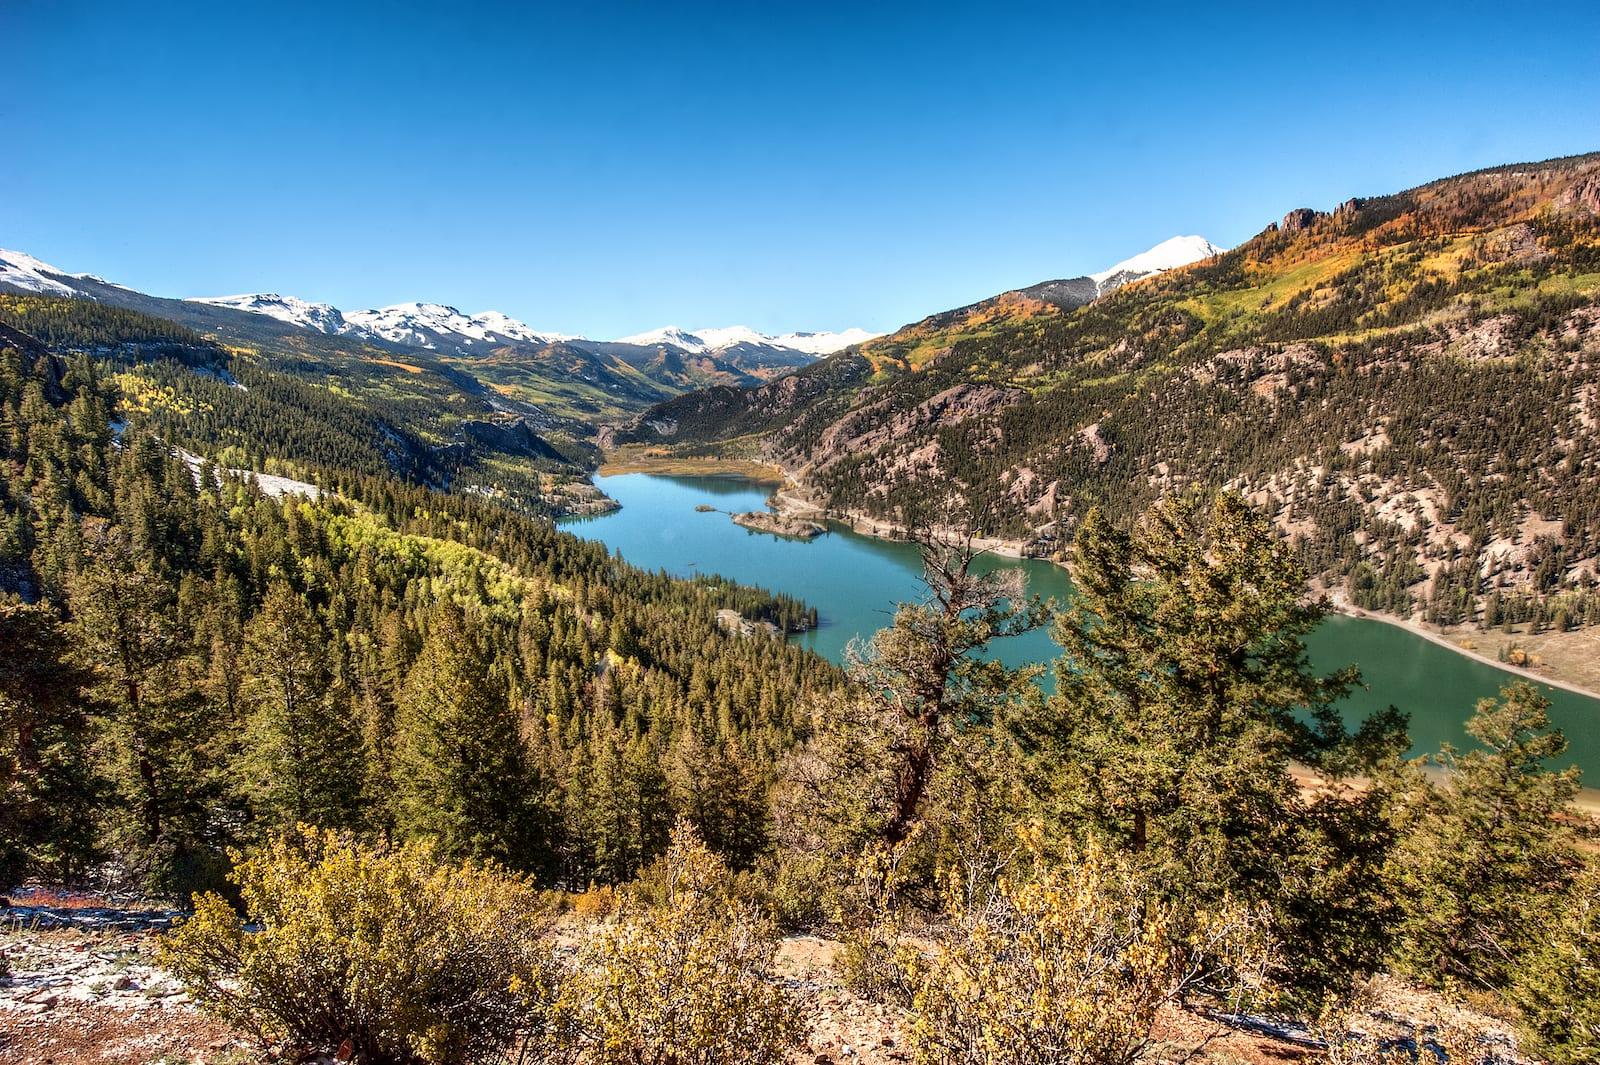 Lake San Cristobal Aerial Overlook Colorado